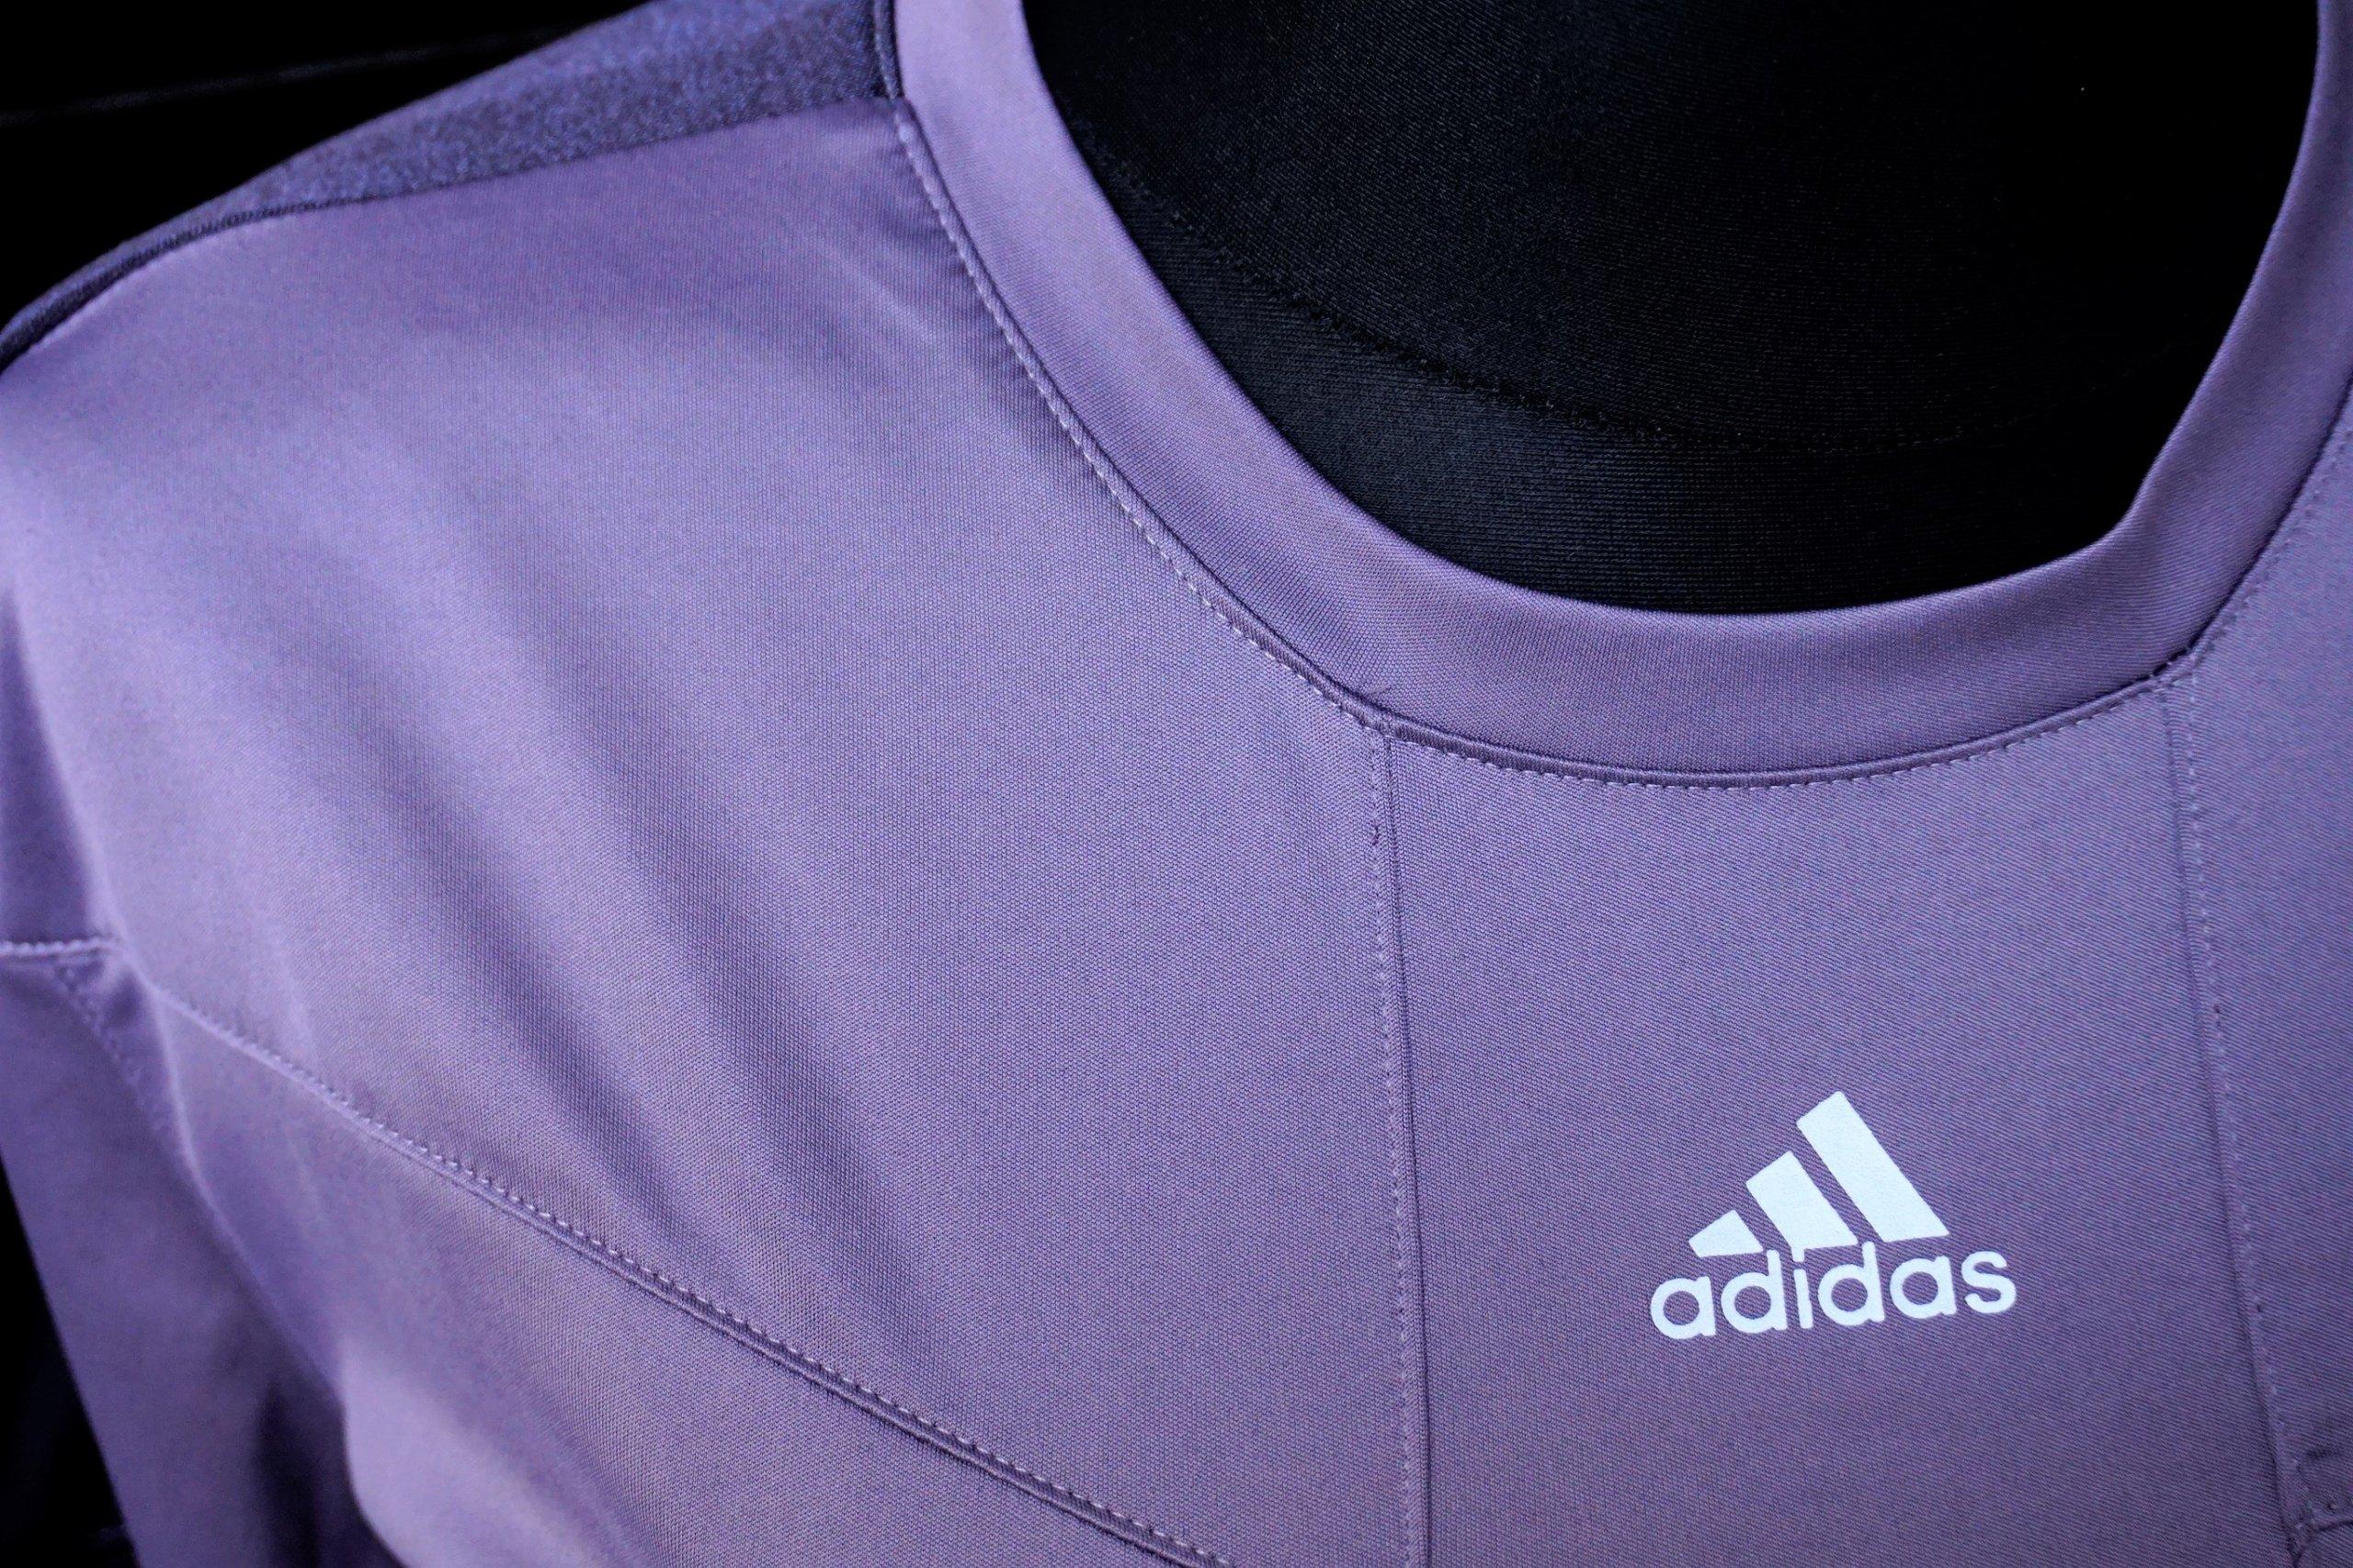 Adidas t-shirt damski 3XL fiolet Nordic Walking